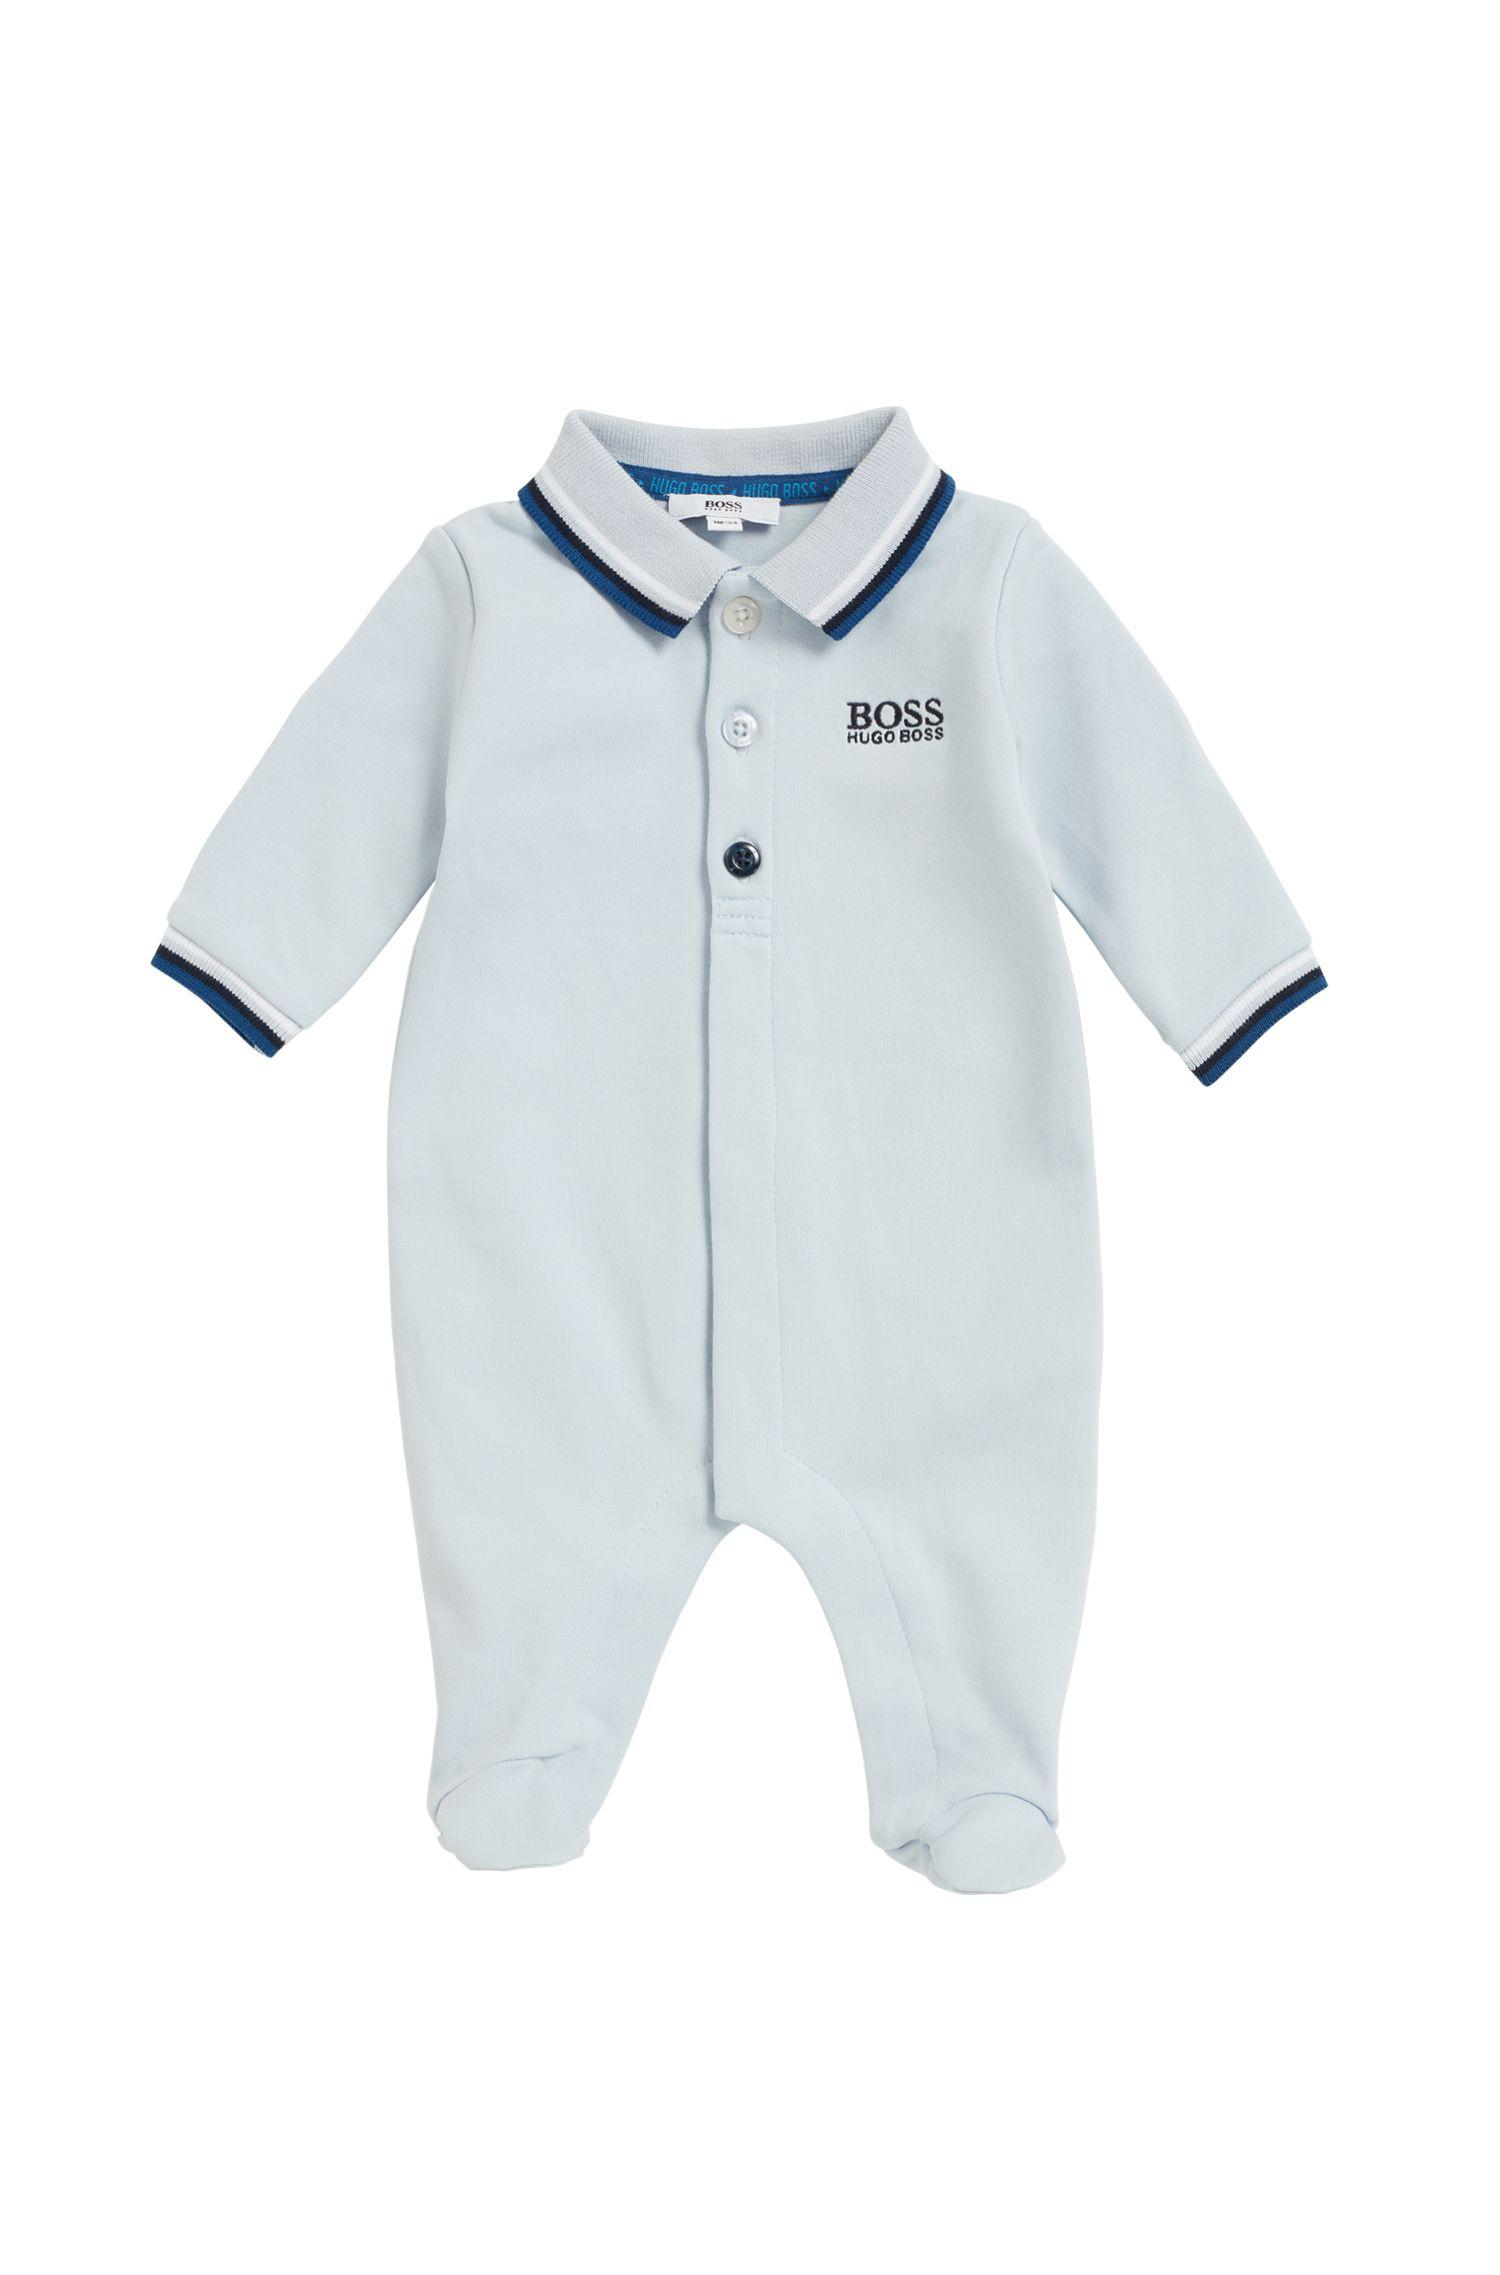 Baby sleepsuit in interlock cotton